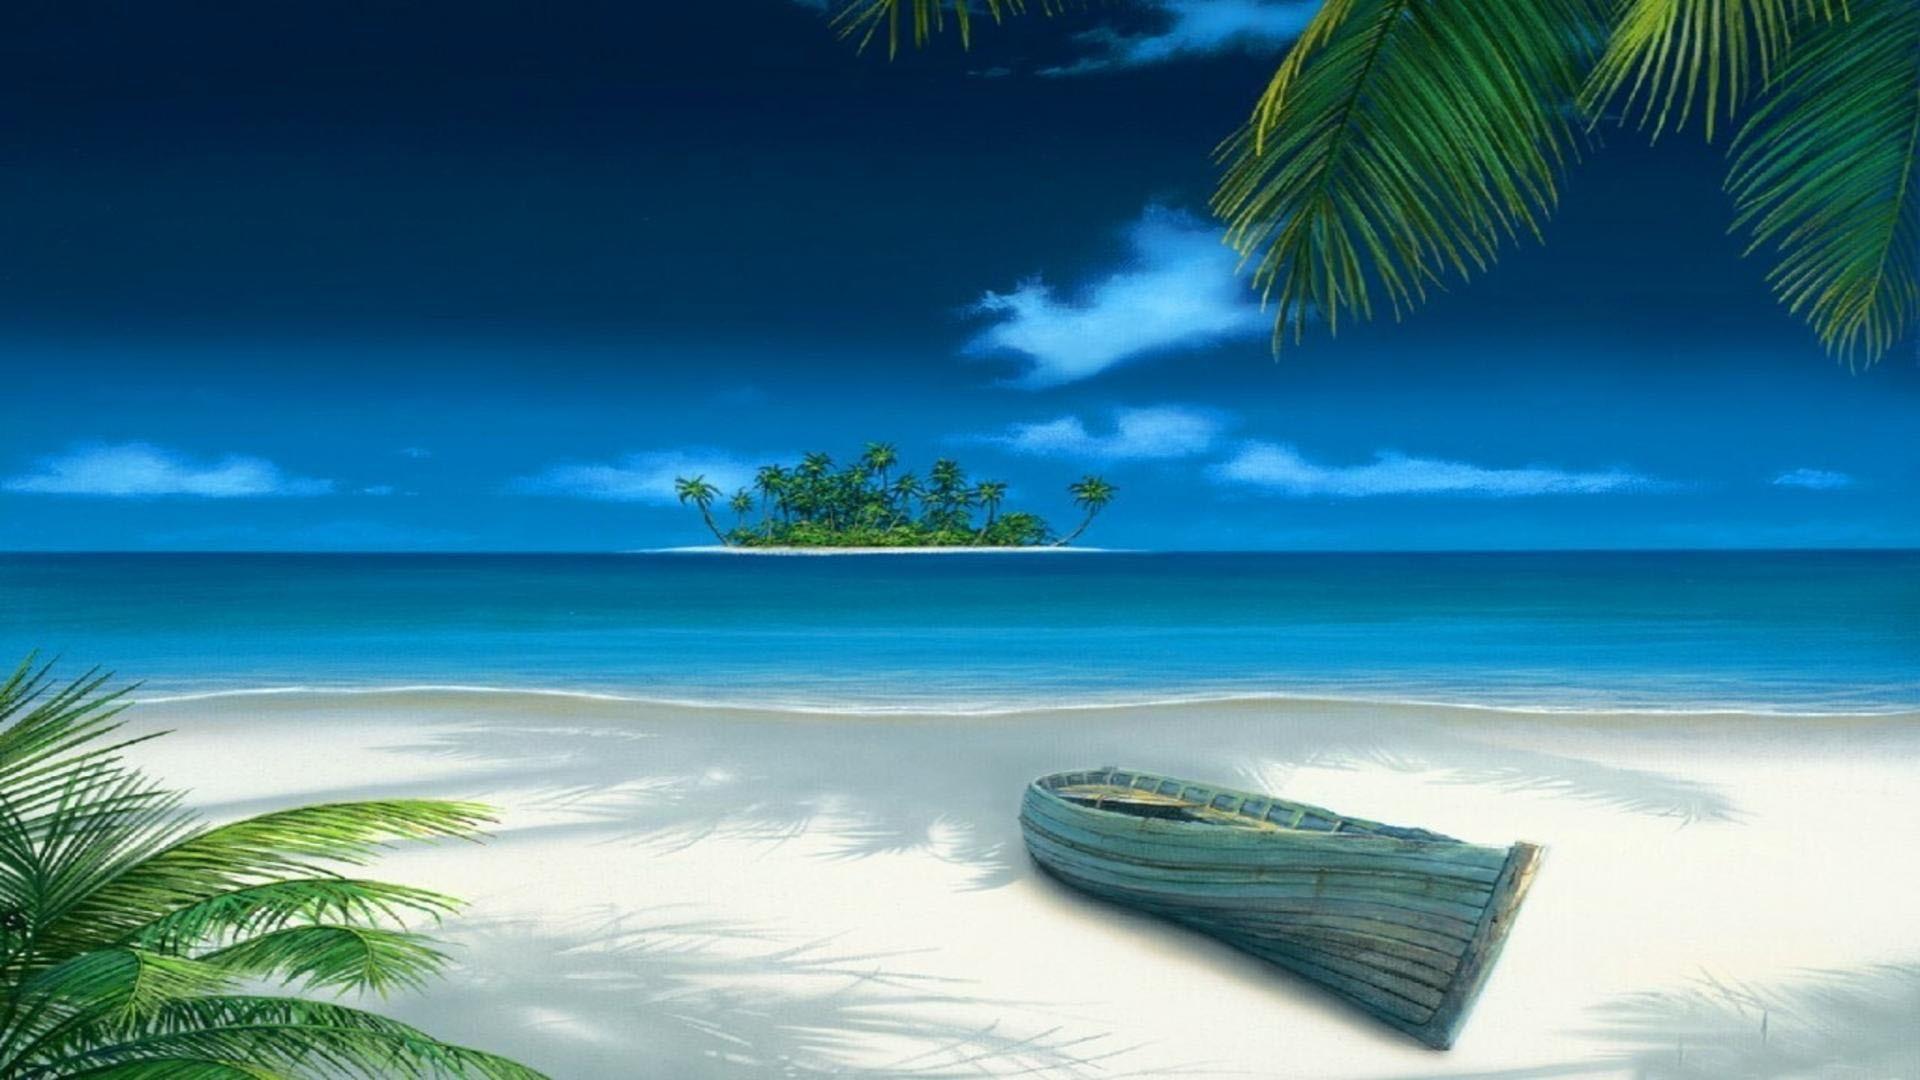 29 Desktop Backgrounds Nature ① Download Free Cool Hd Backgrounds